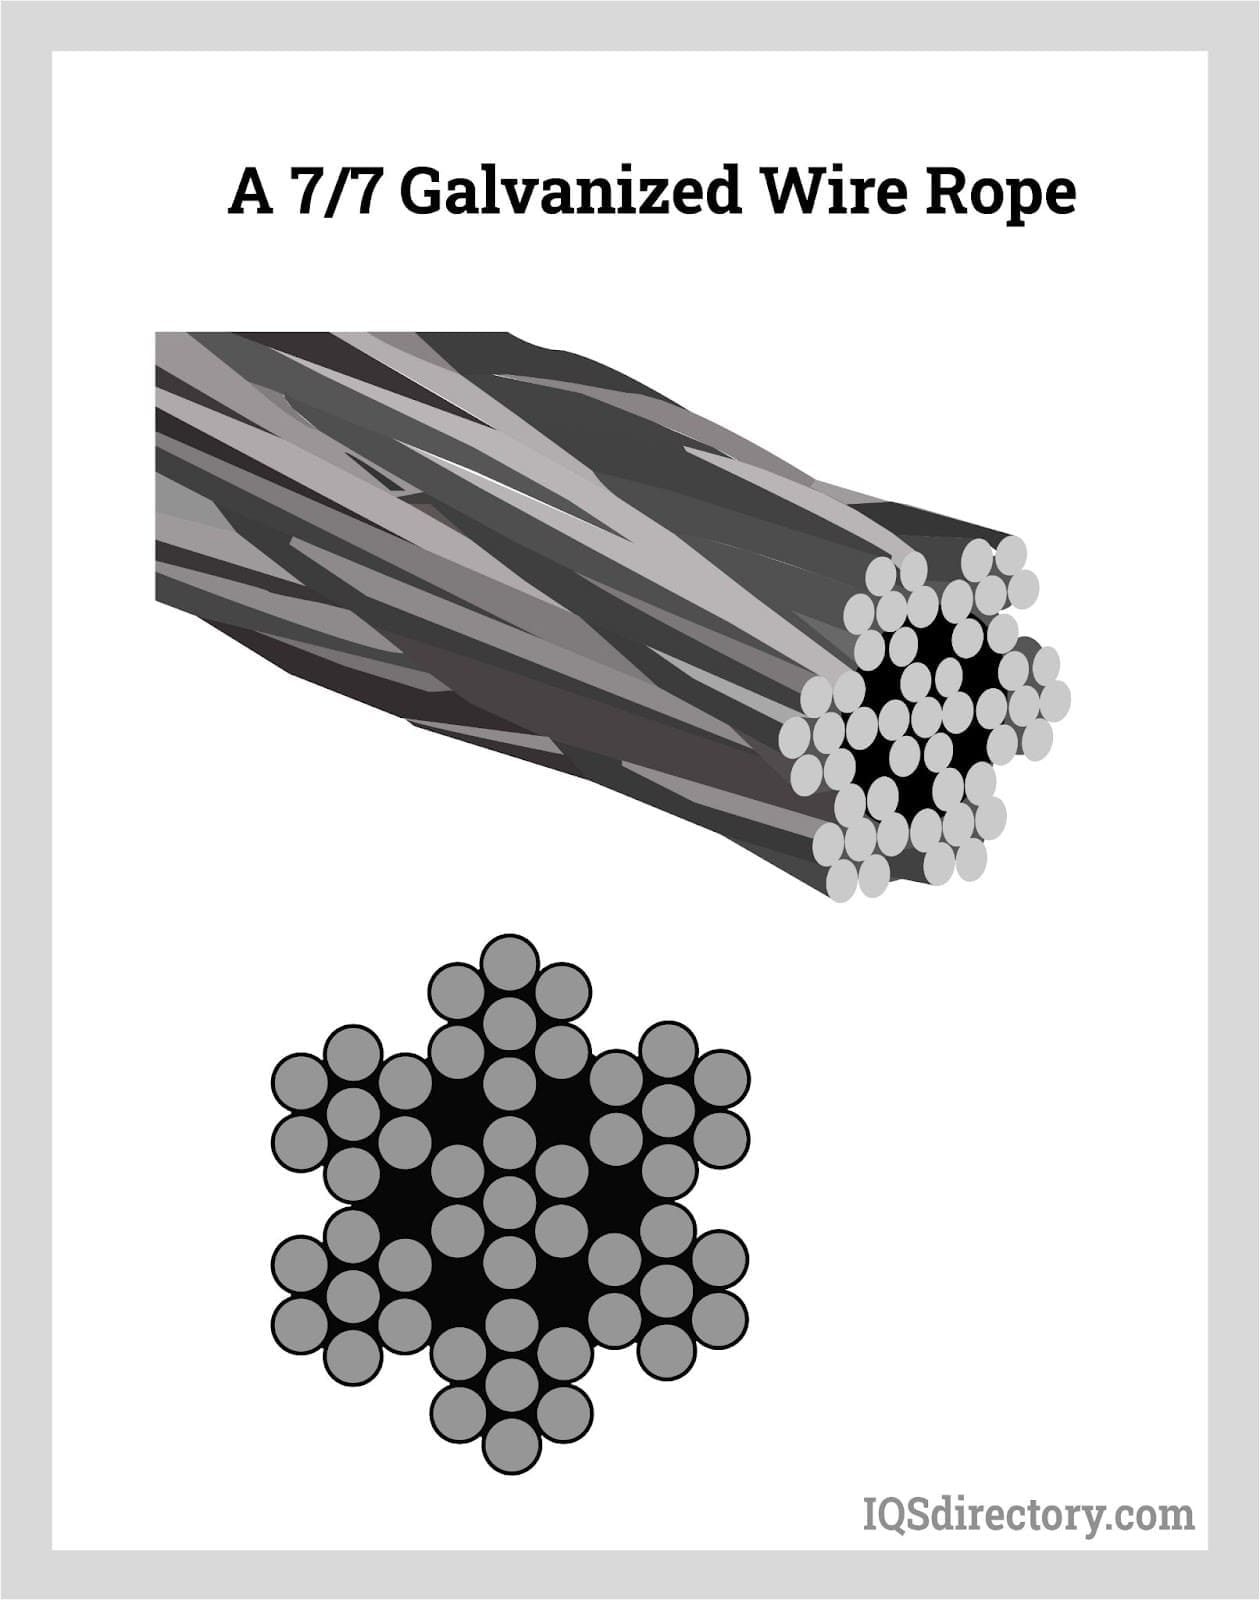 A 7/7 Galvanized Wire Rope